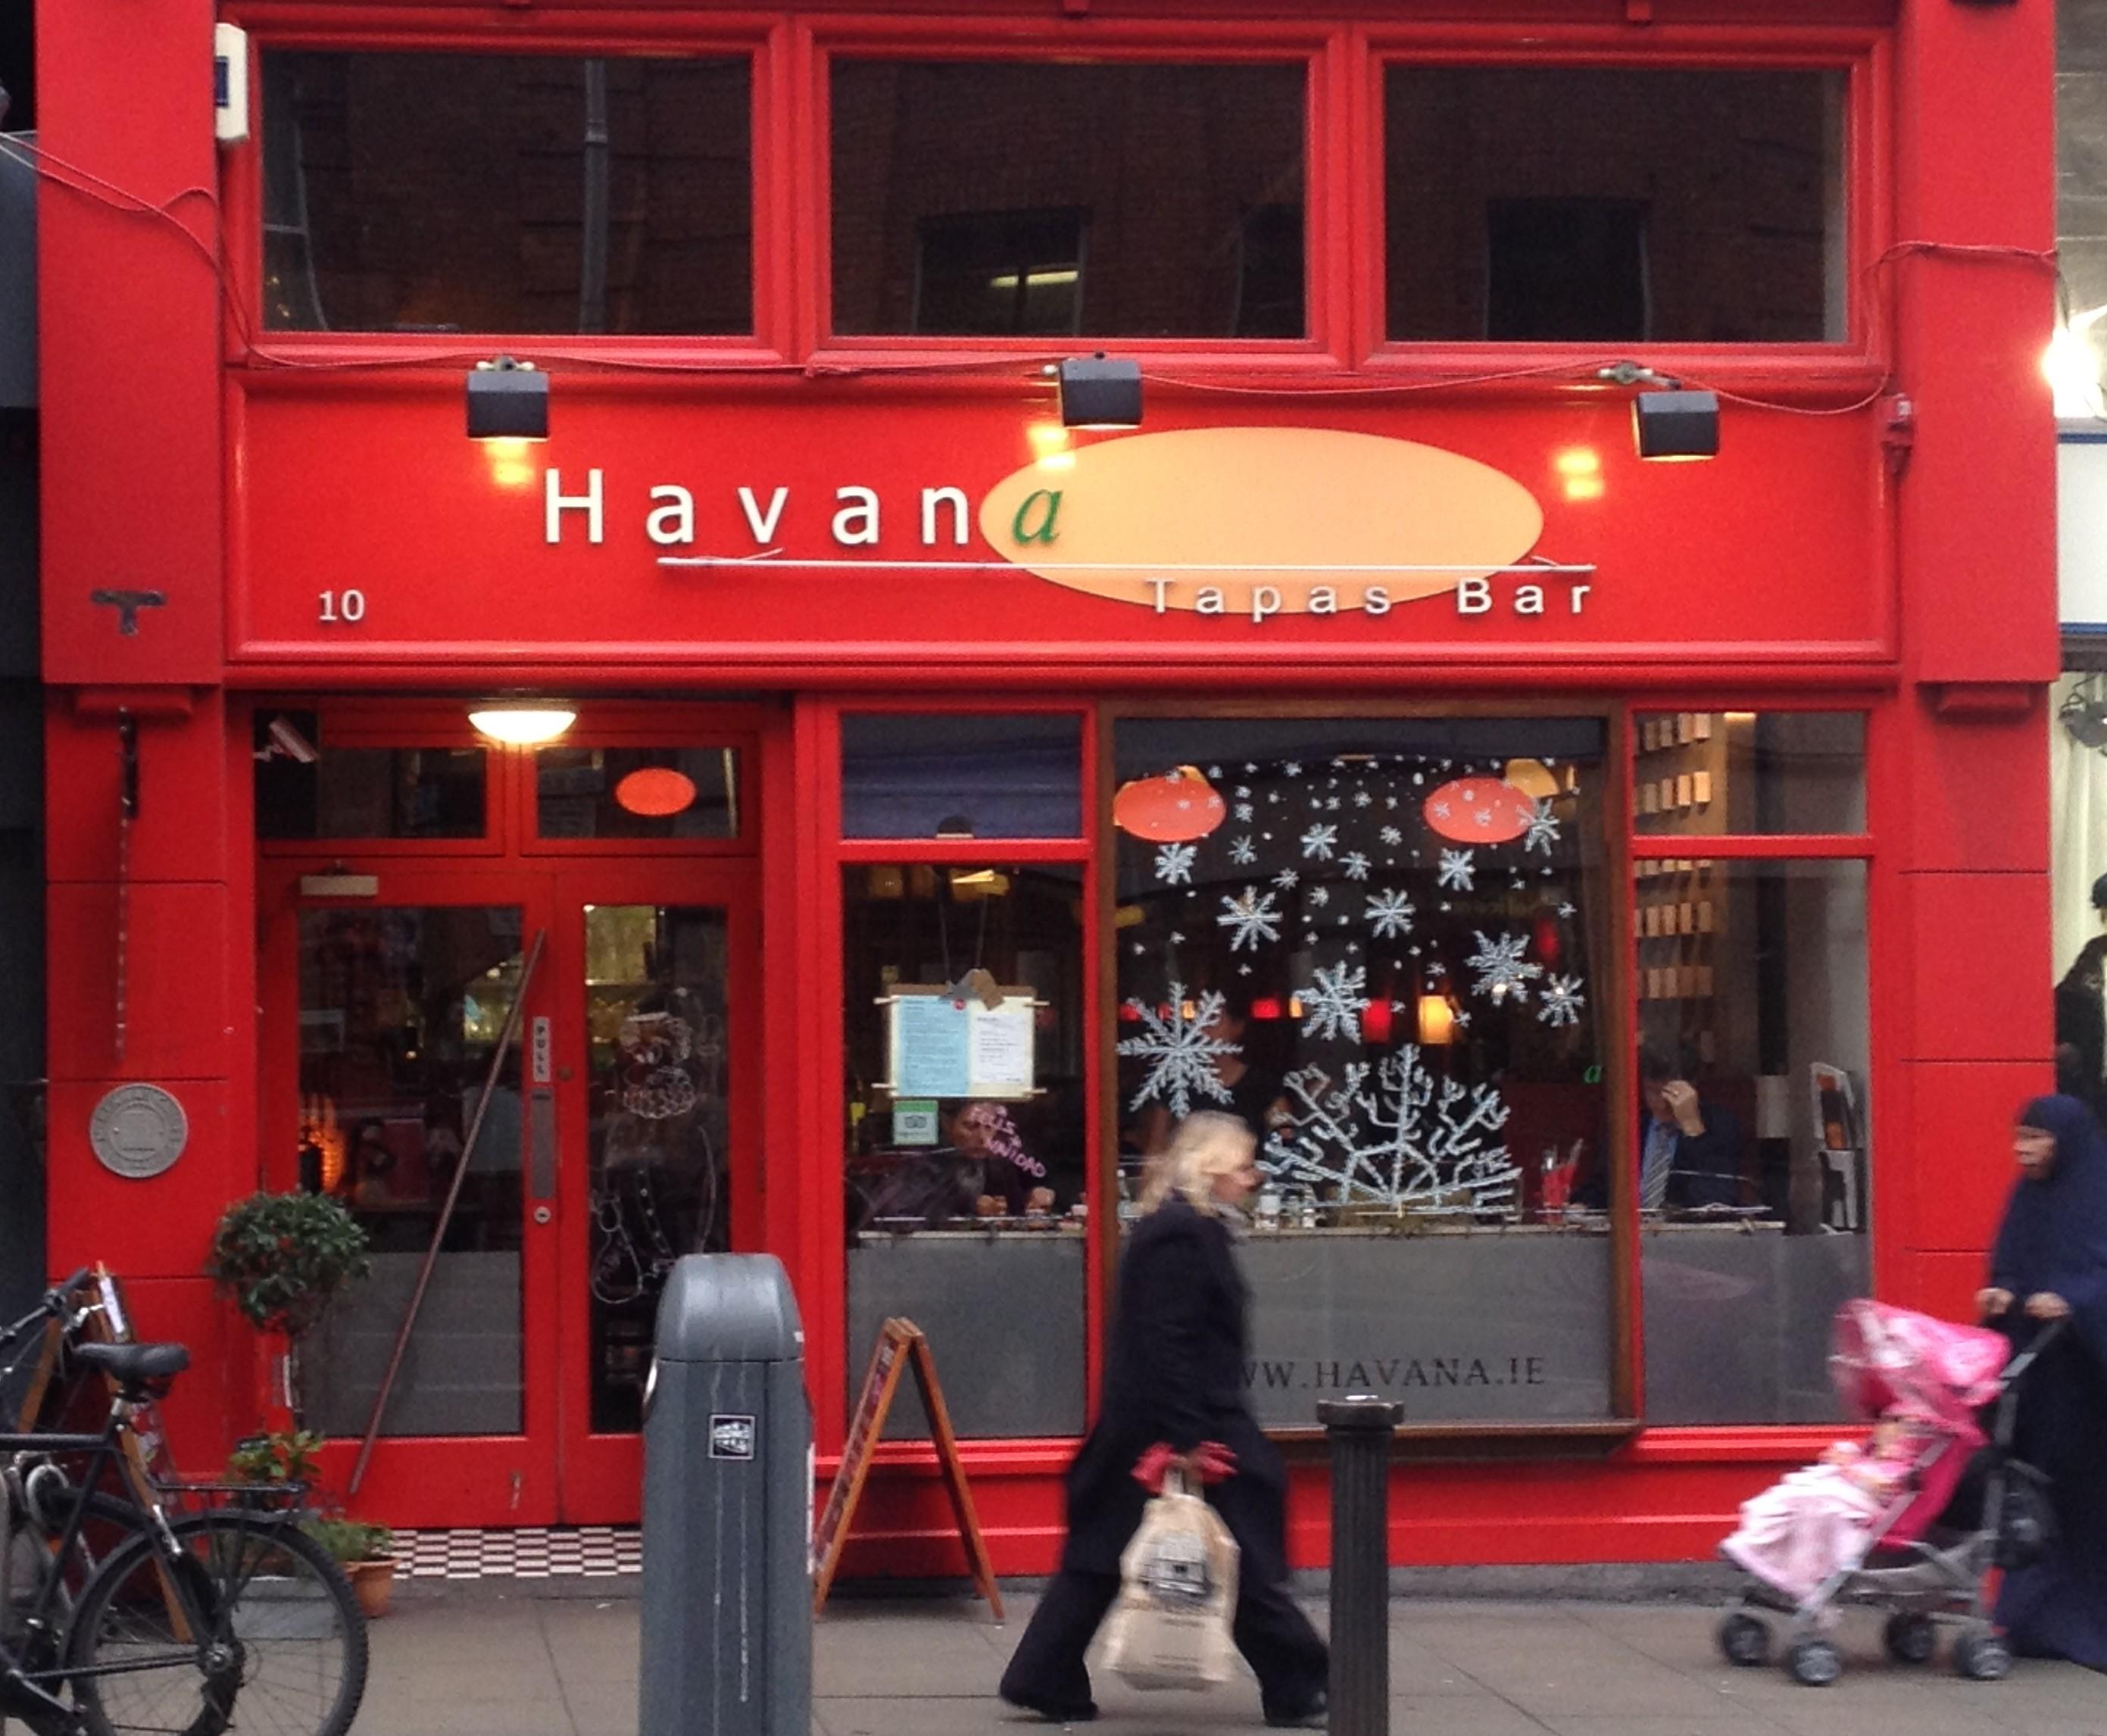 Havana Restaurant Dublin Menu